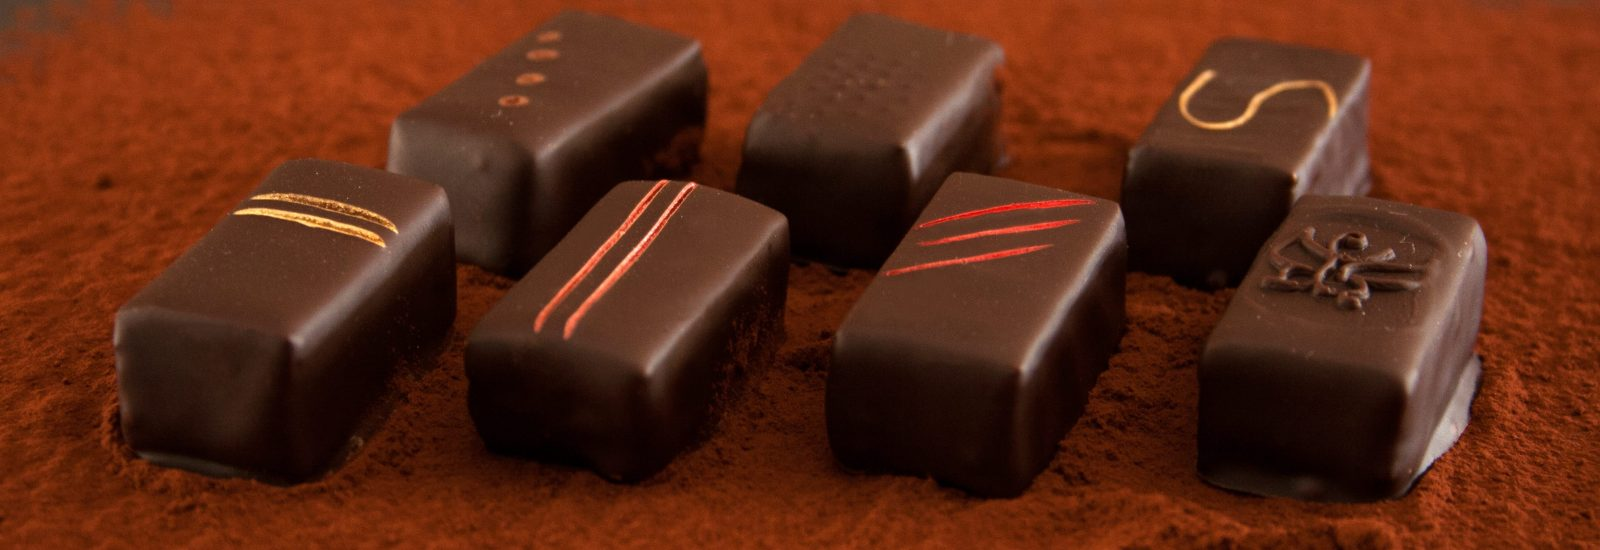 Groupe de chocolats